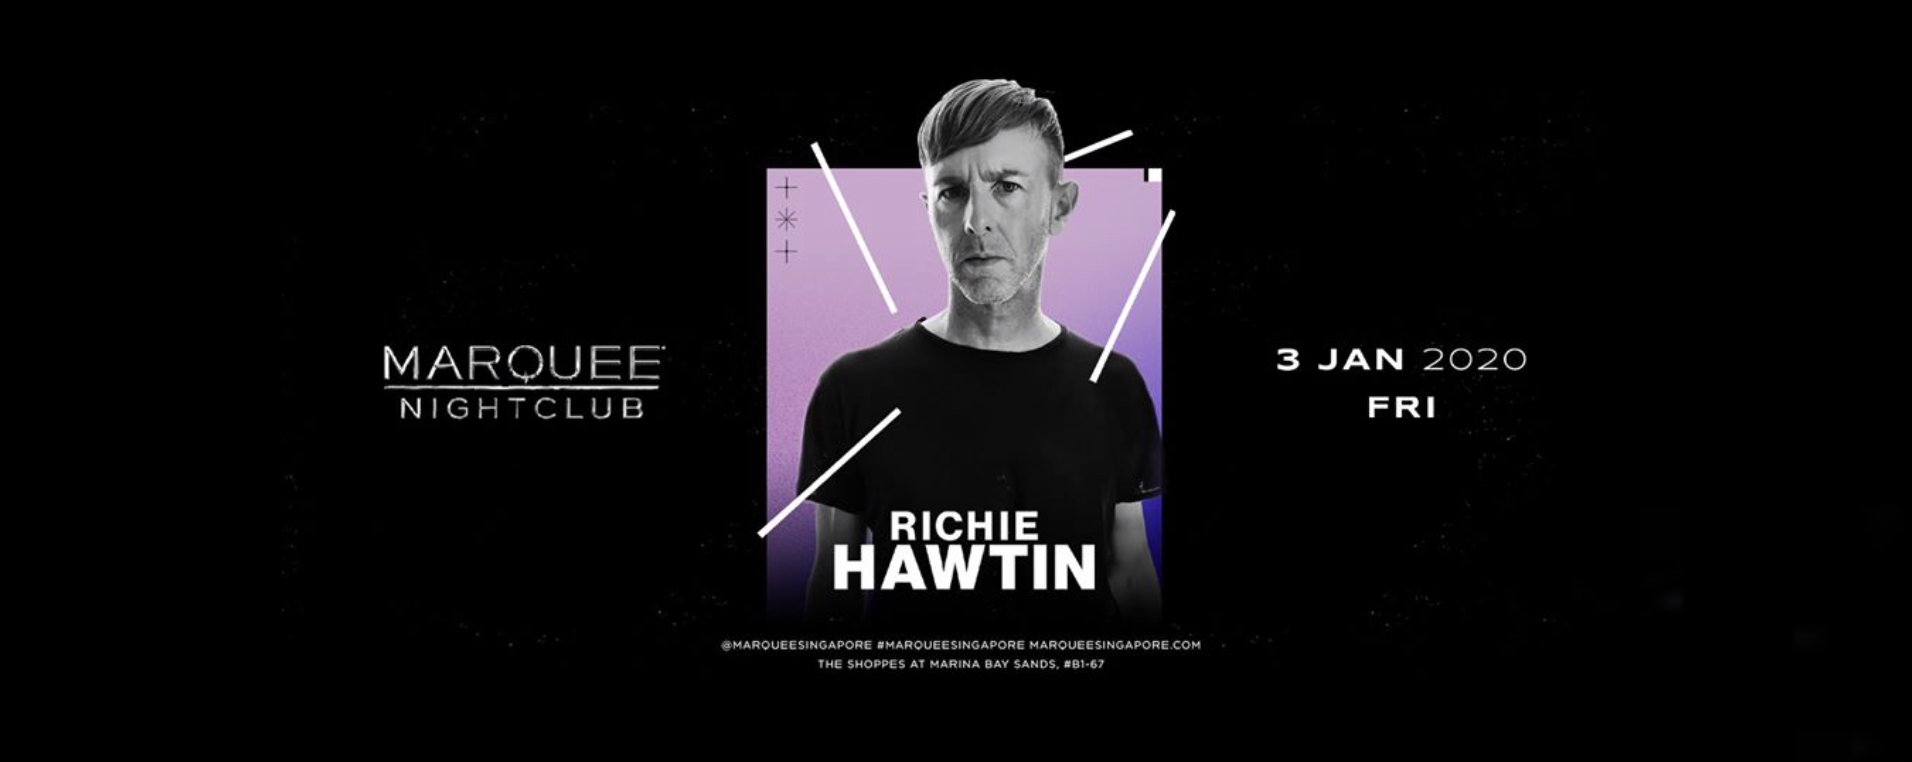 Marquee Singapore Presents Richie Hawtin